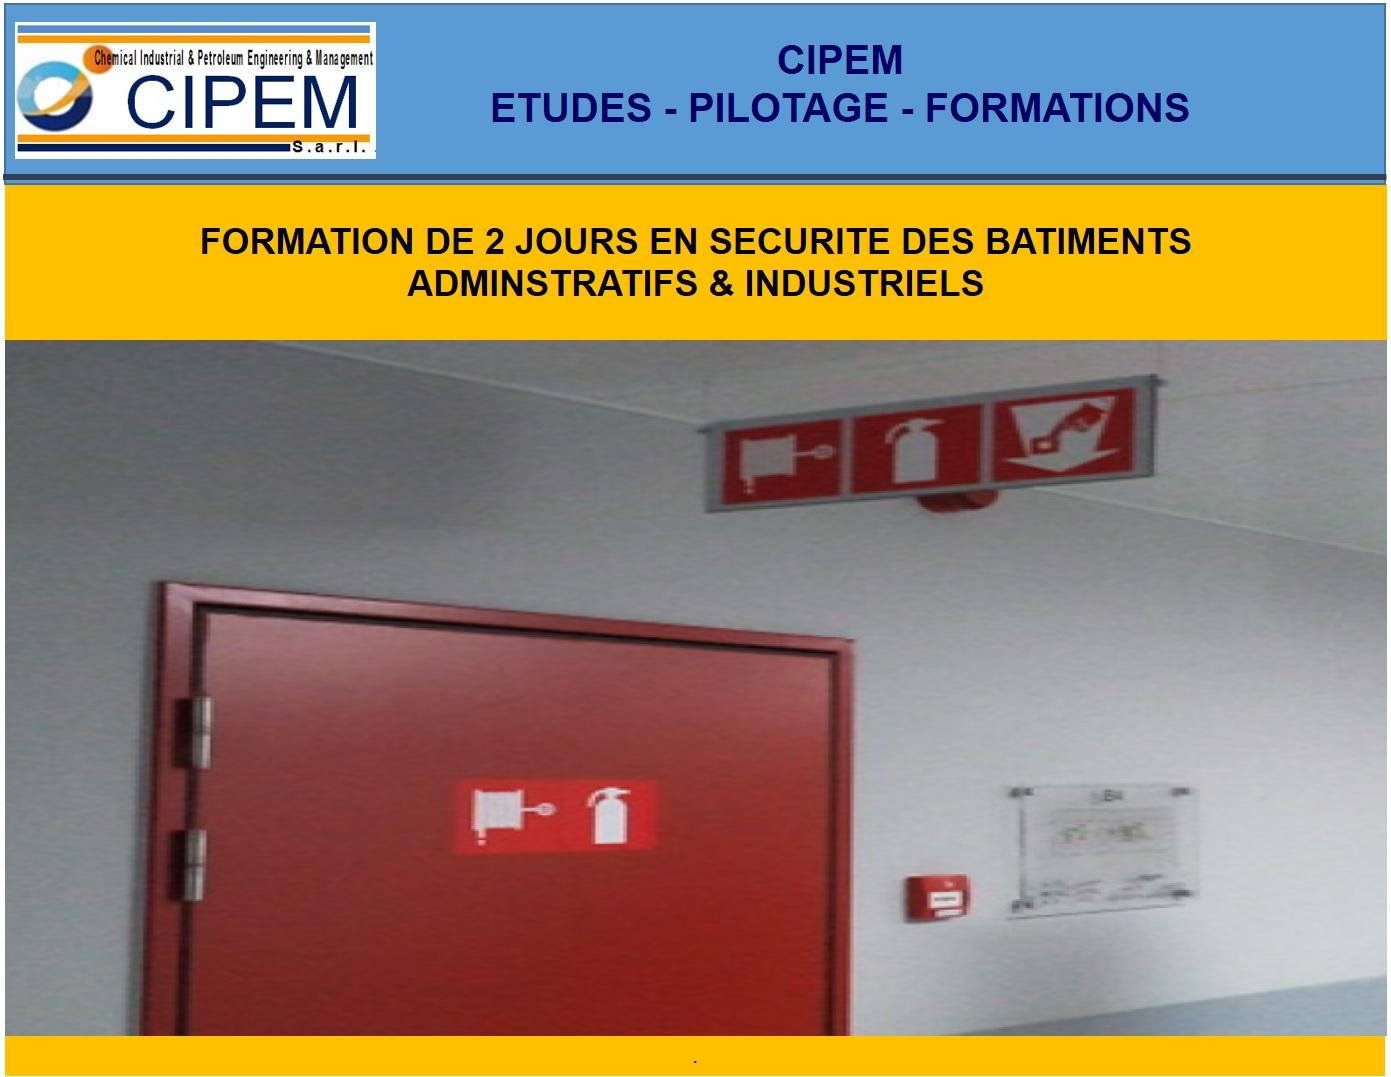 securite des batiments administratifs industriels normes et reglementations en vigueur tunisie. Black Bedroom Furniture Sets. Home Design Ideas